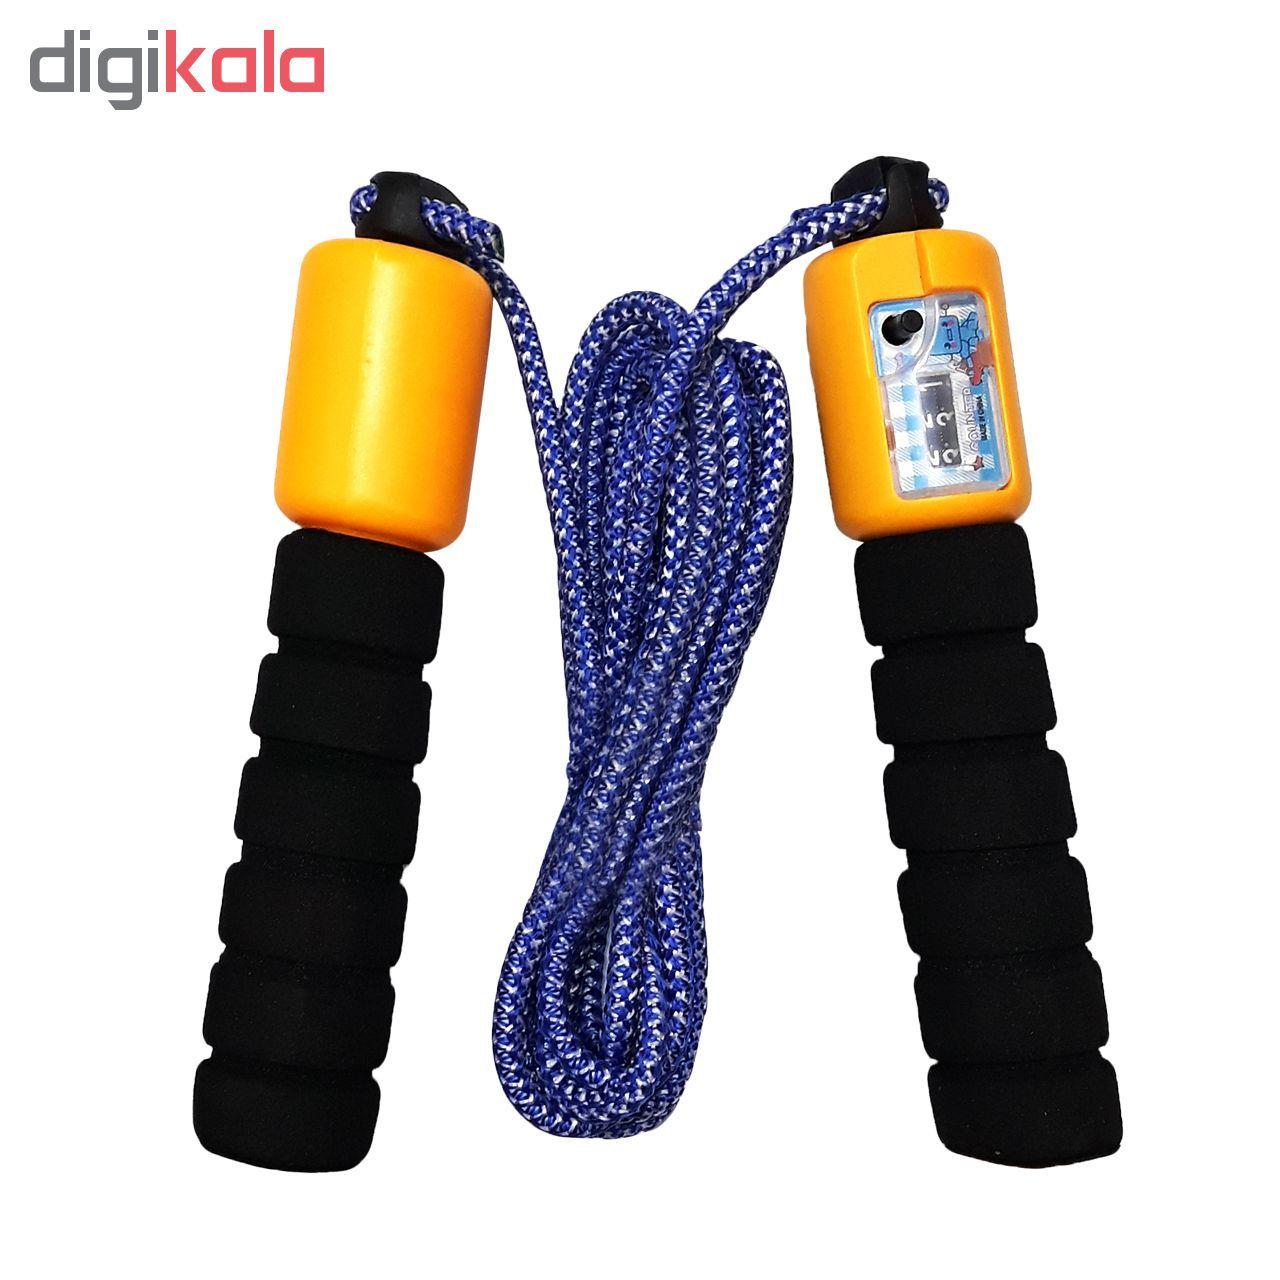 طناب ورزشی کد 319 main 1 2